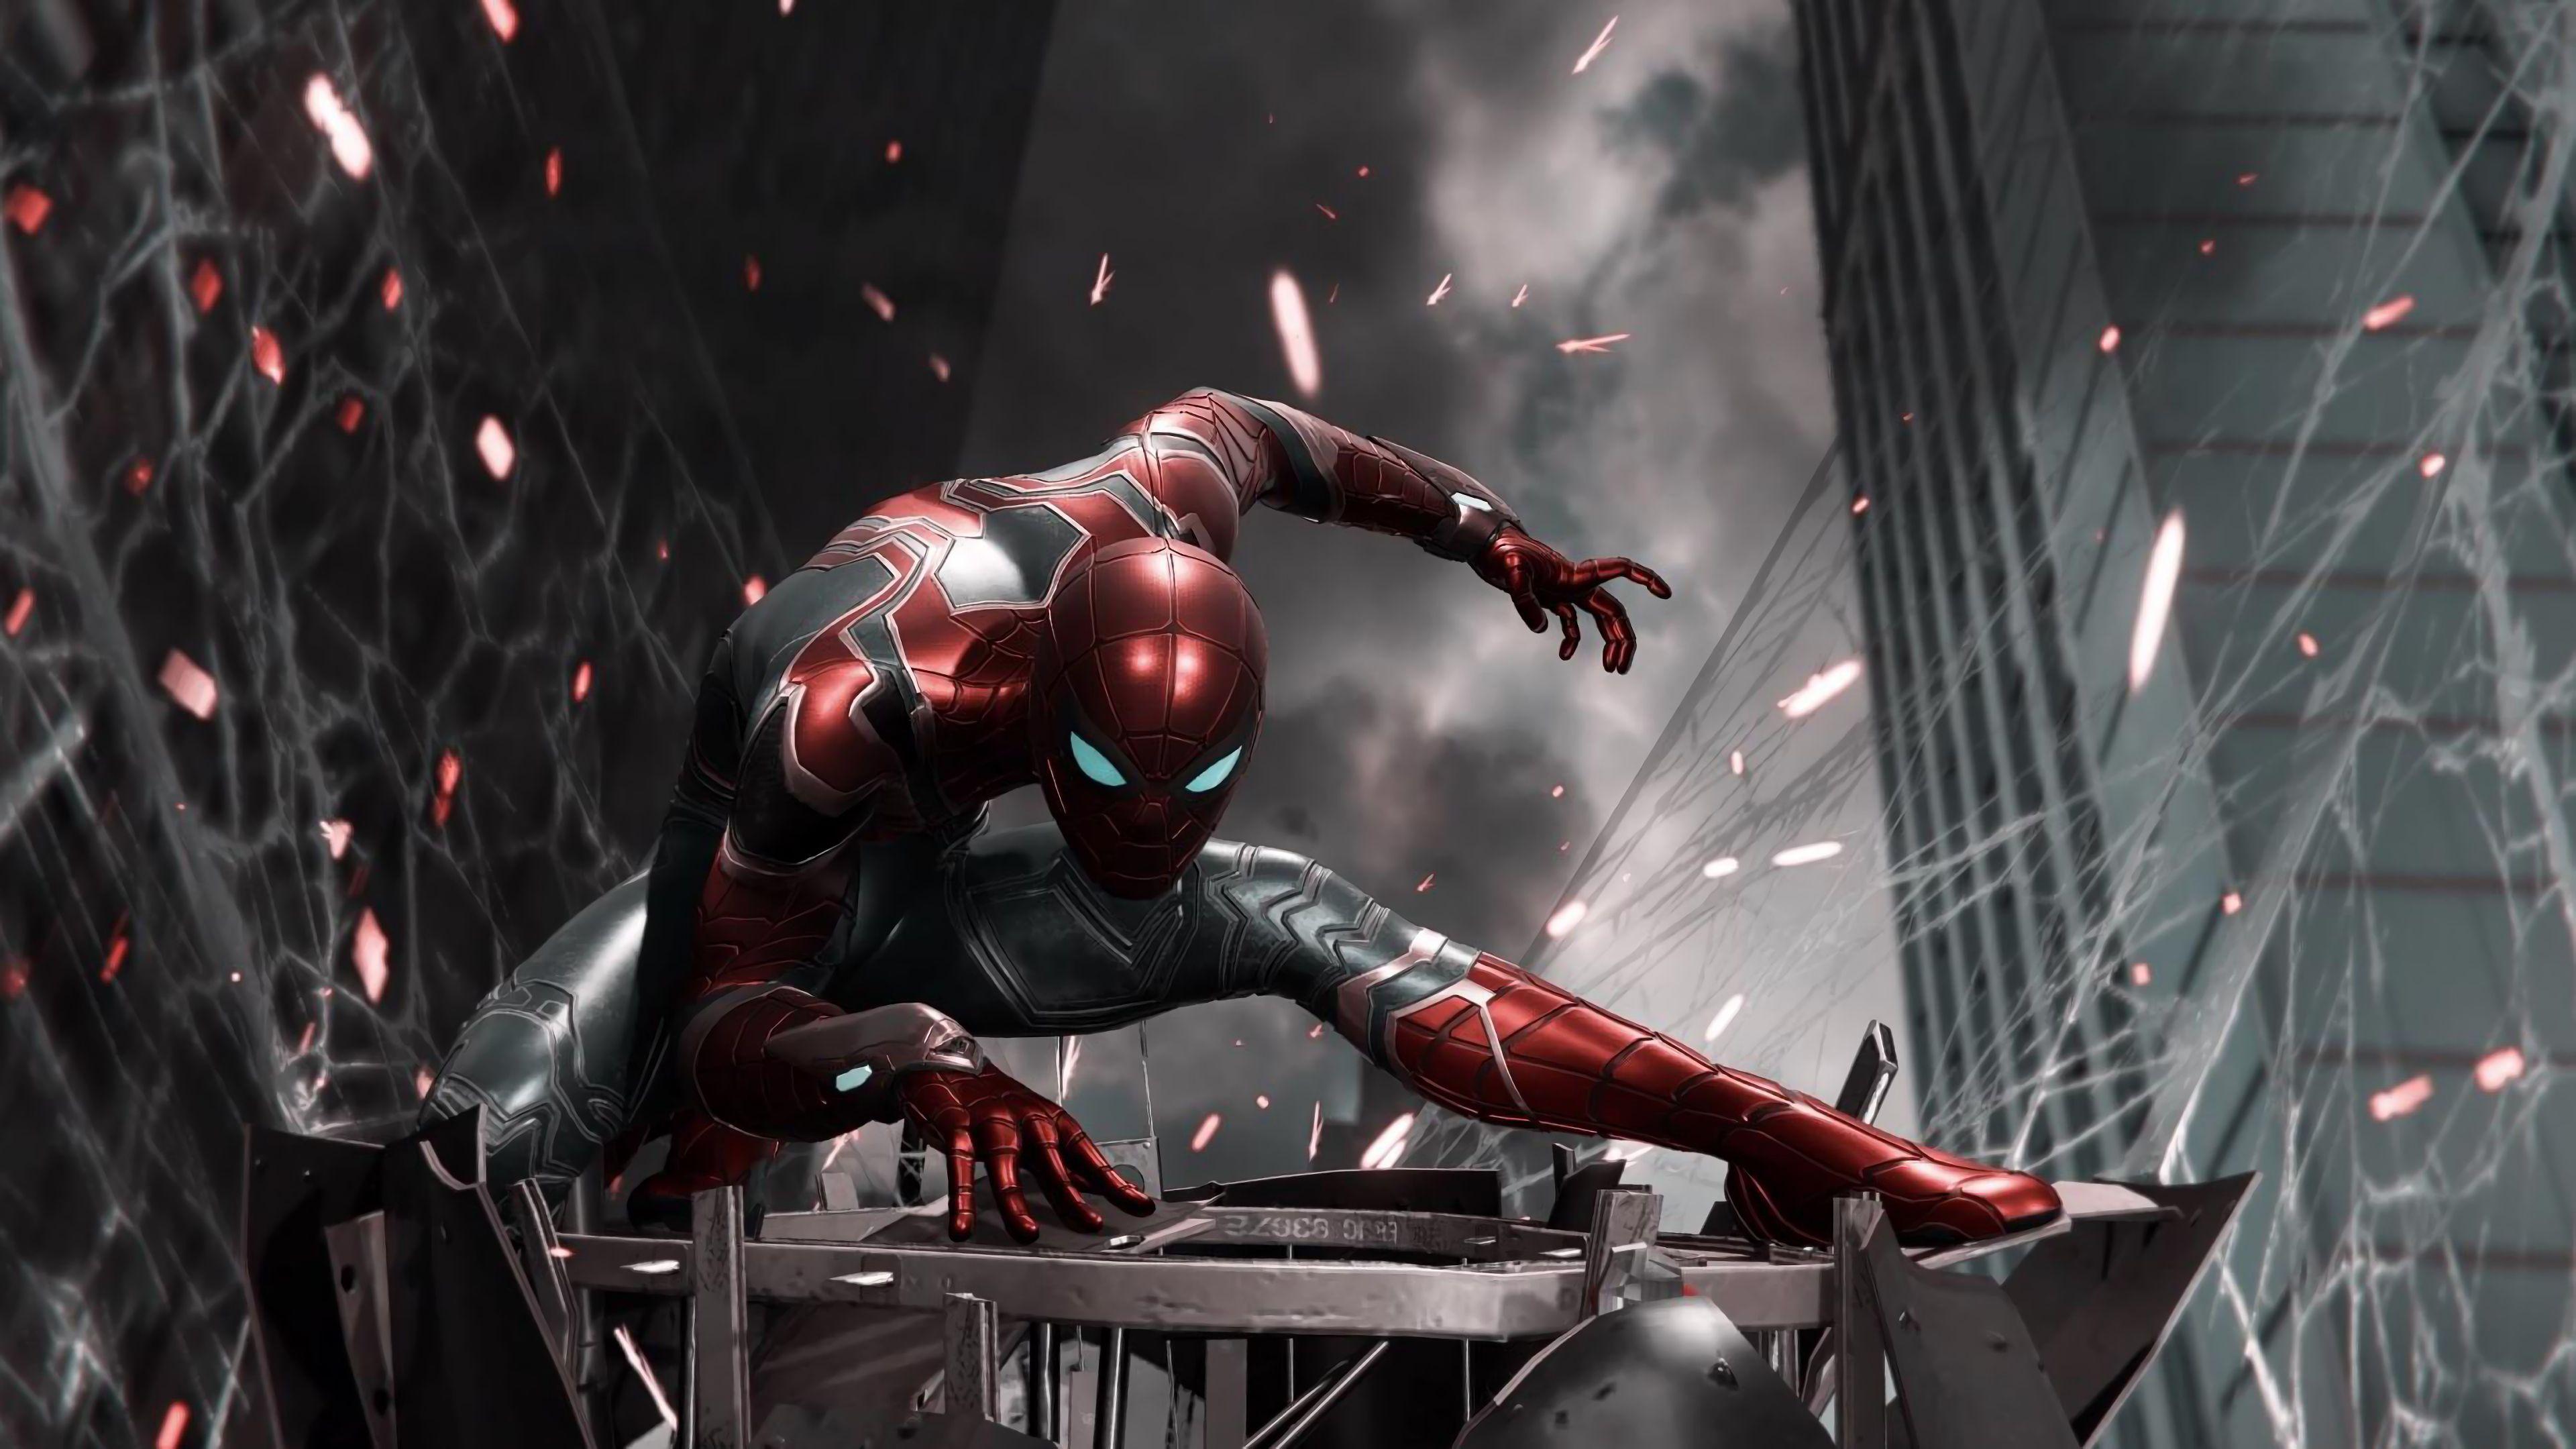 Pin By Ilya Nadyrshin On Spider Man Wallpapers Spiderman